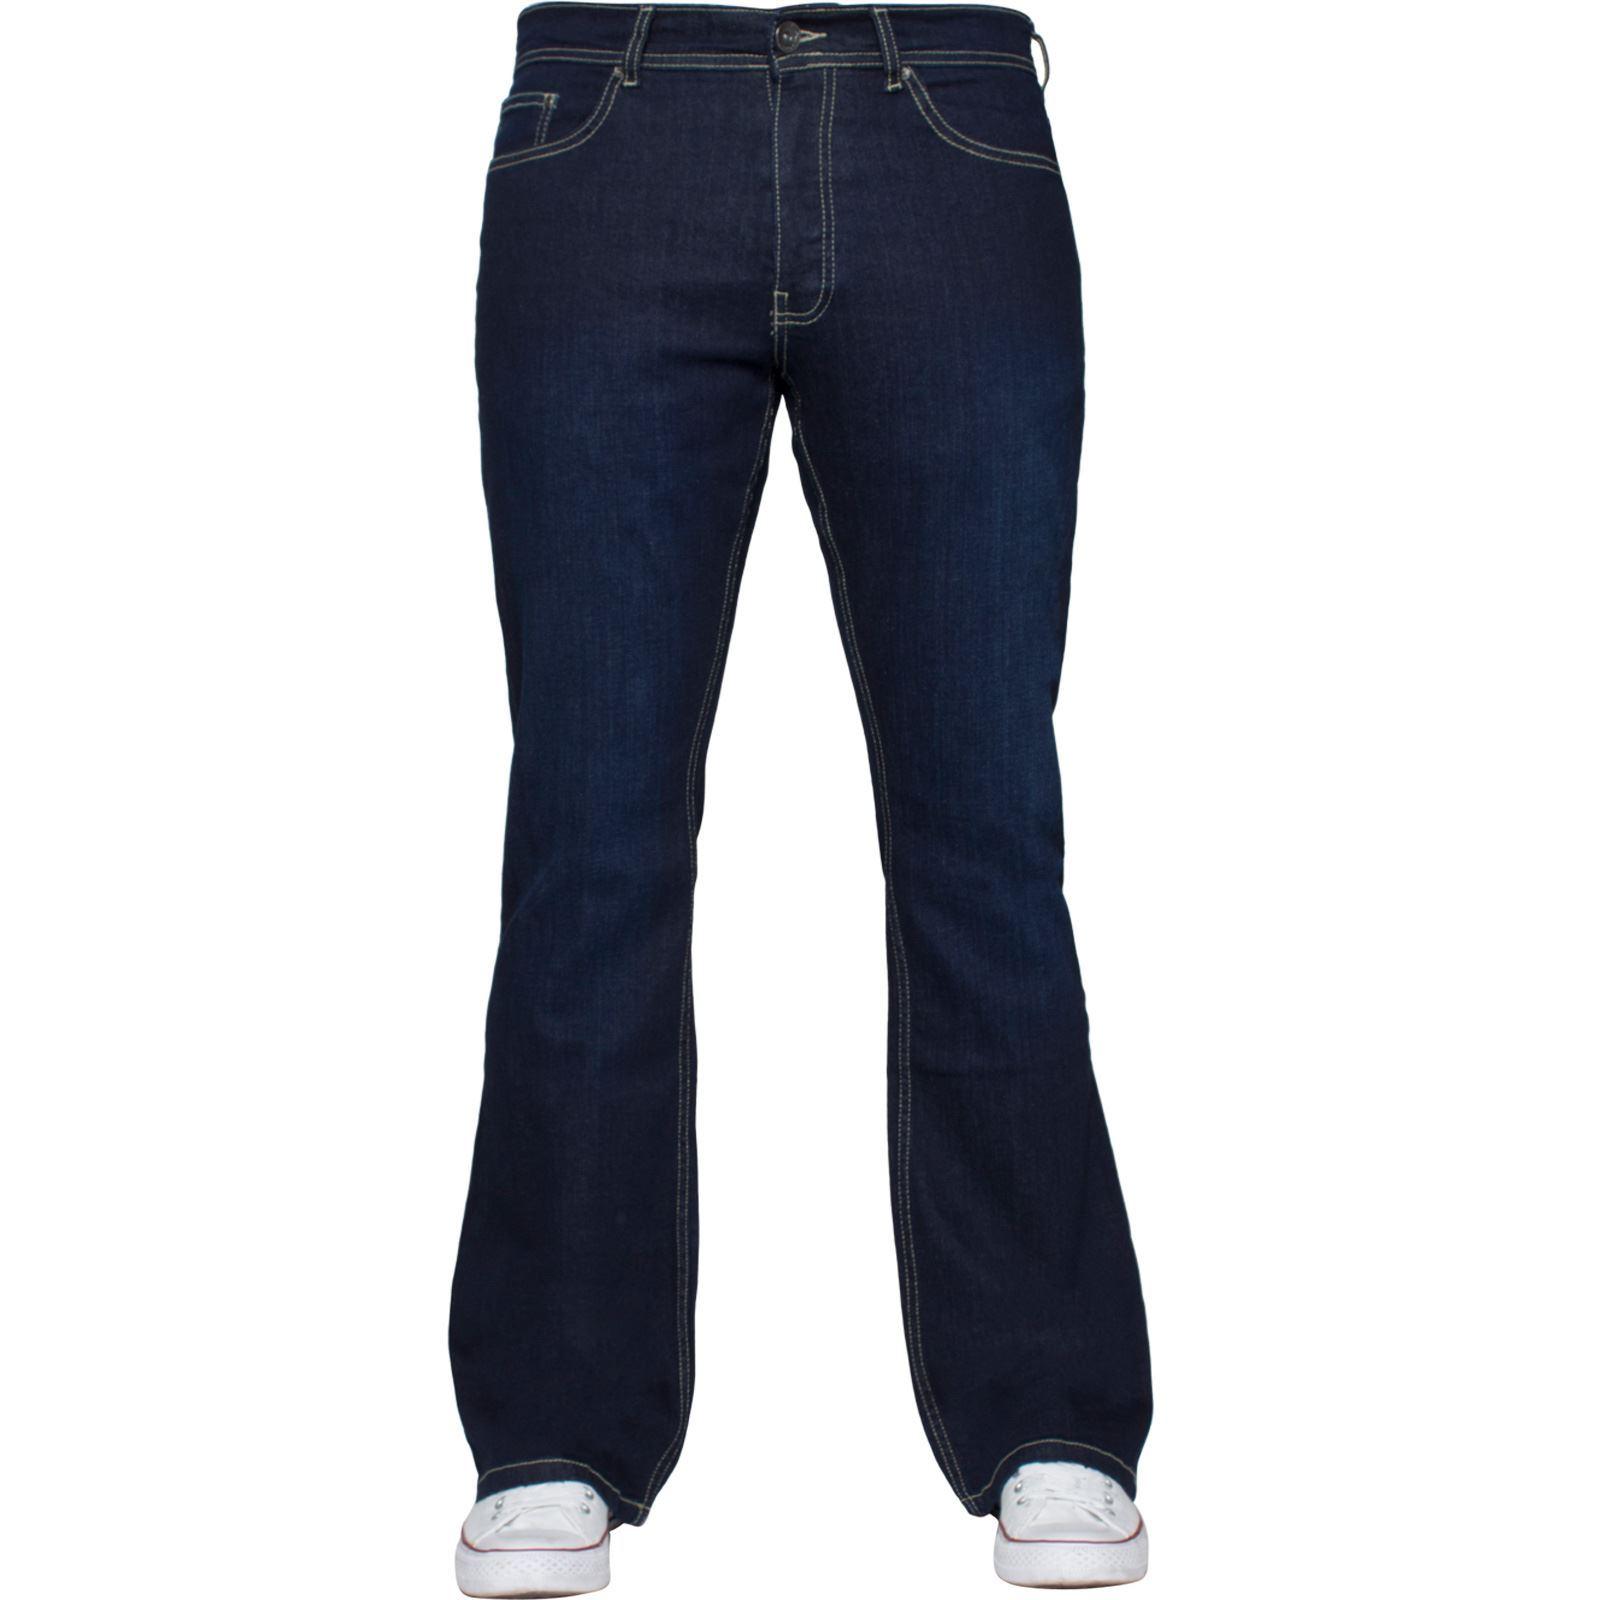 Para-Hombre-Pierna-Recta-Bootcut-Stretch-Denim-Regulares-Pantalon-de-trabajo-Kruze-Todas-Cinturas miniatura 94